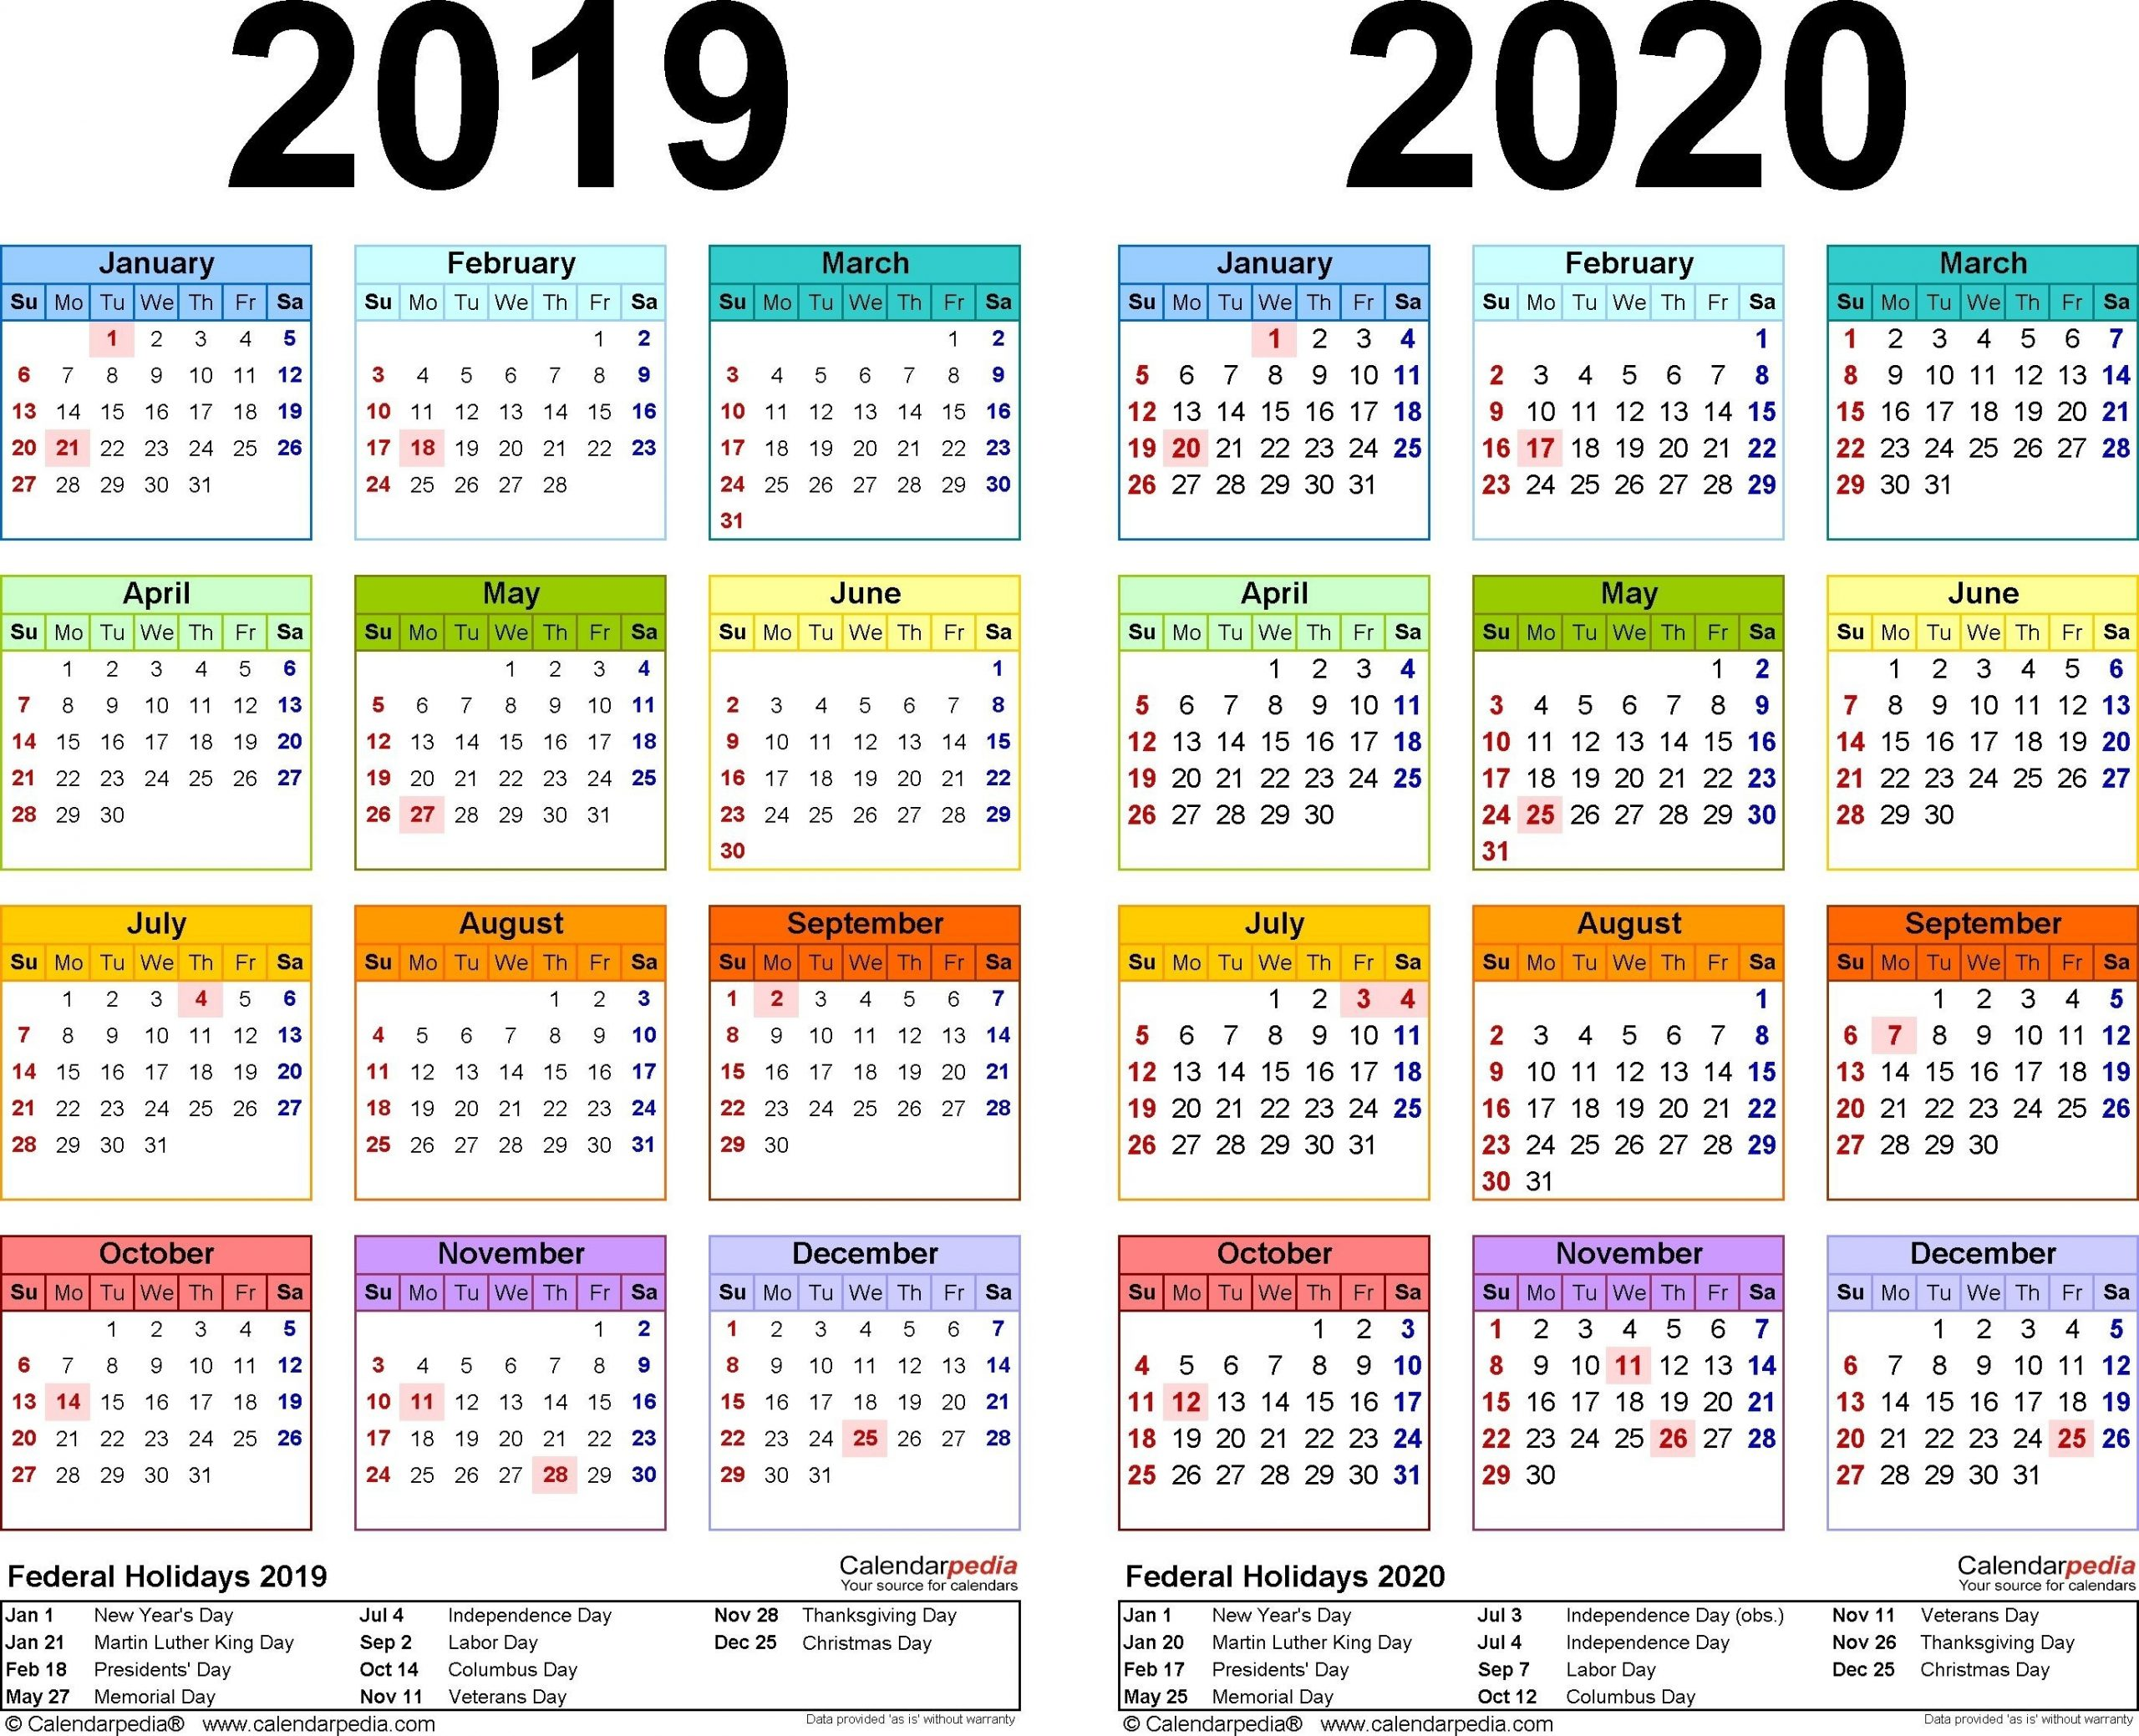 Printable 2020 Shift Calendar | Calendar Template Printable Monthly Yearly-Calendar For Shift Work 2021